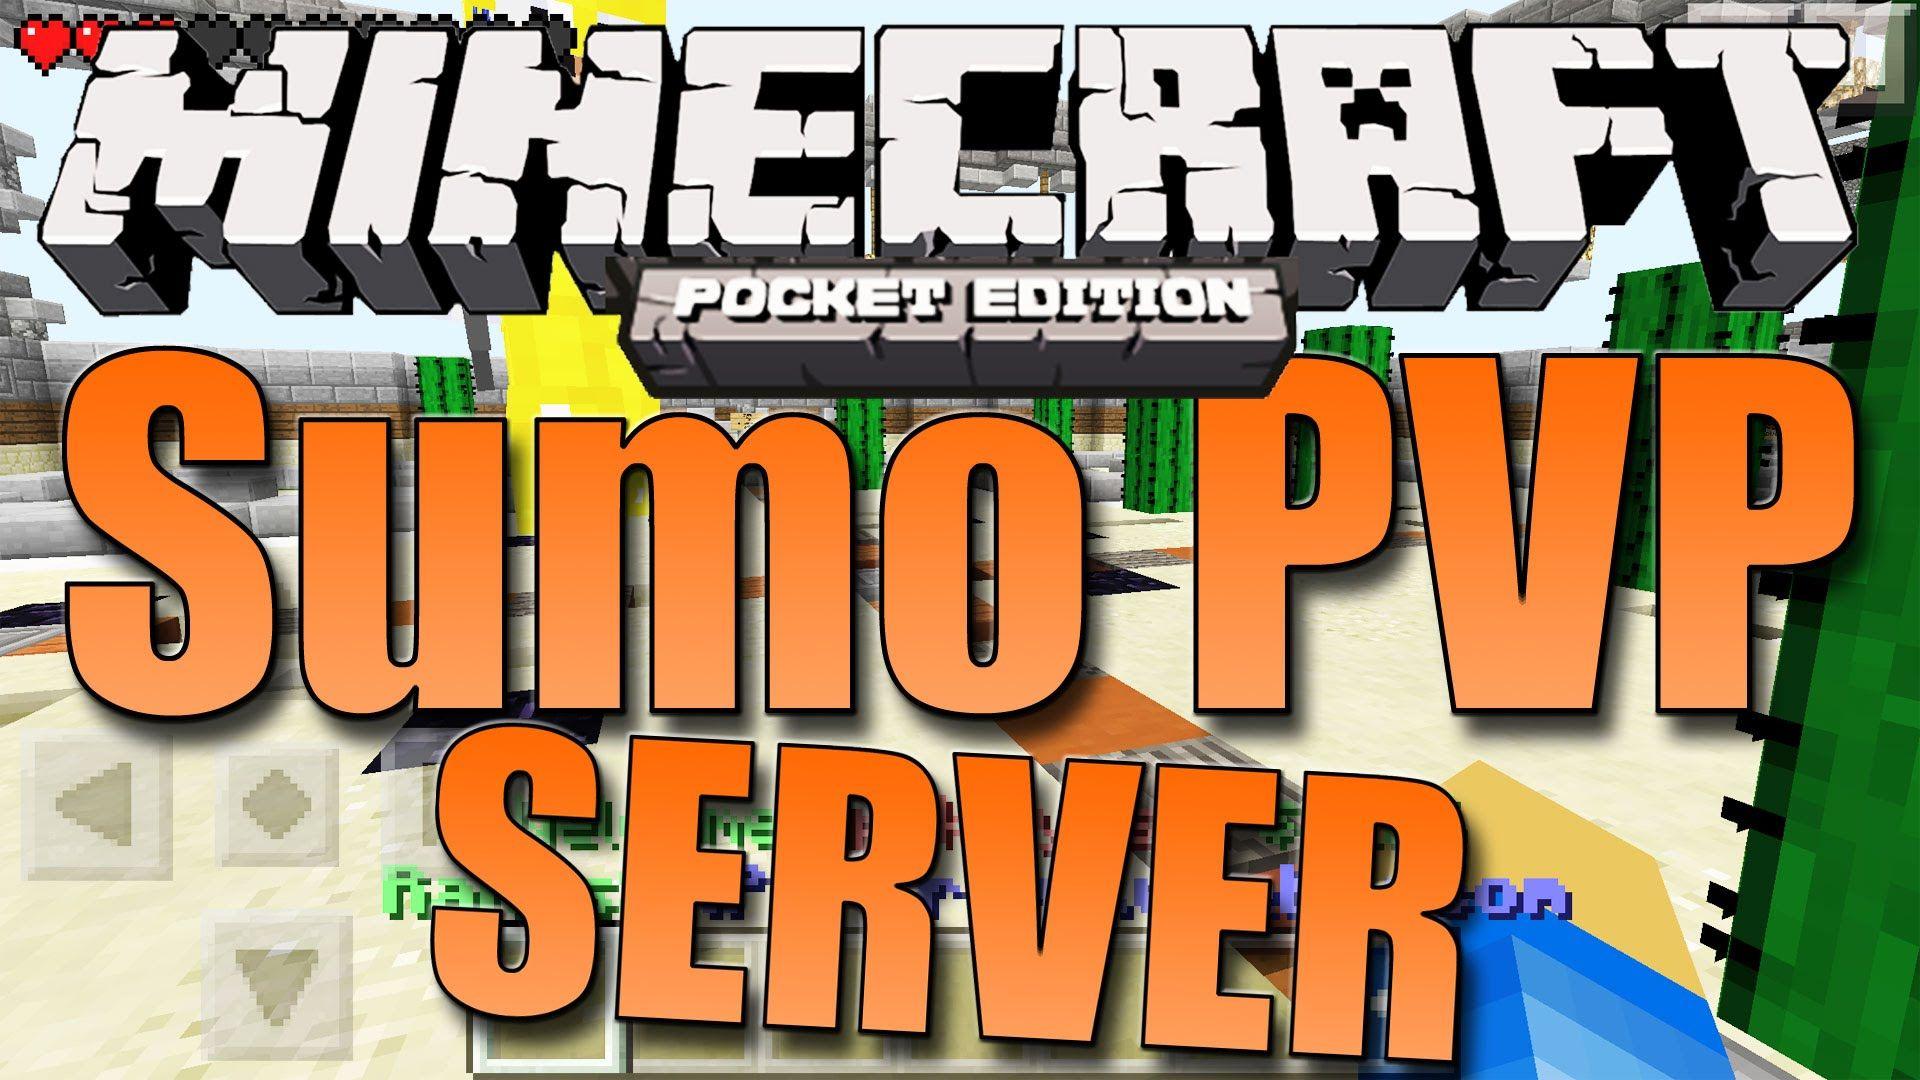 Minecraft Pe 0 11 1 Sumo Battle Server Apok S Server Tour Day 1 Minecraft Pe Minecraft Pocket Edition Pocket Edition